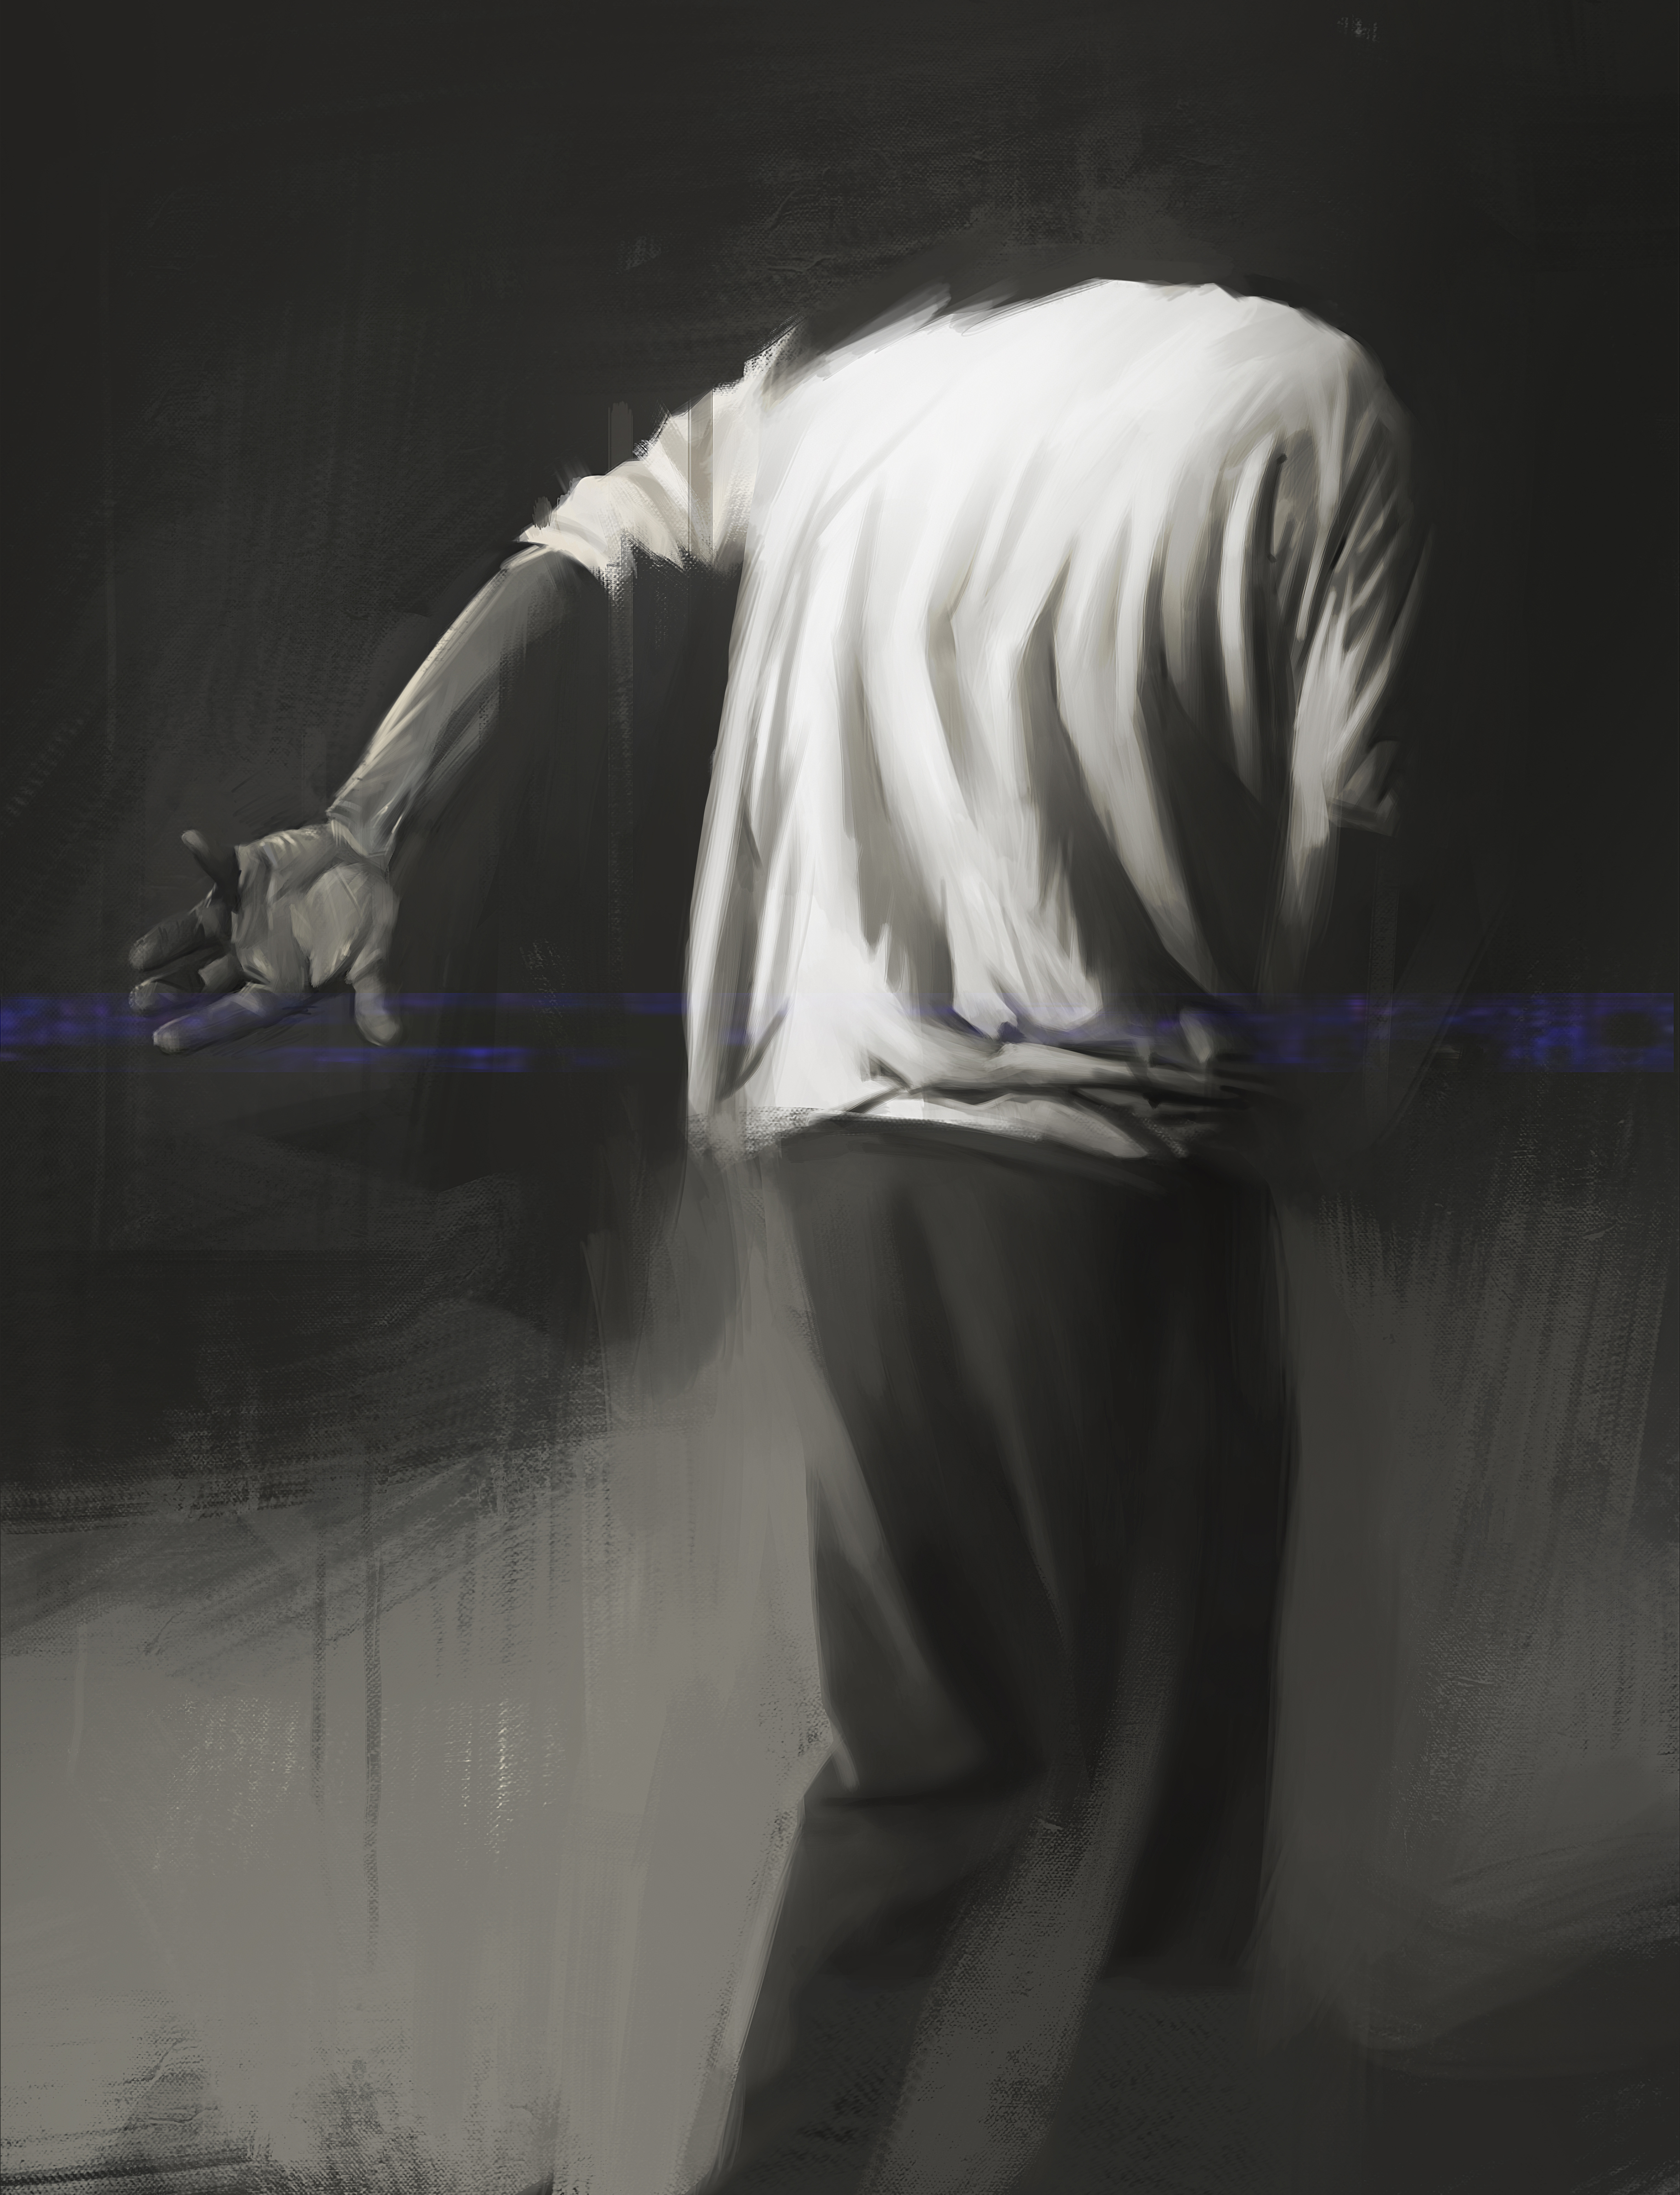 igor-kovalov-untitled-1-23x30-inches-digital-painting.jpg